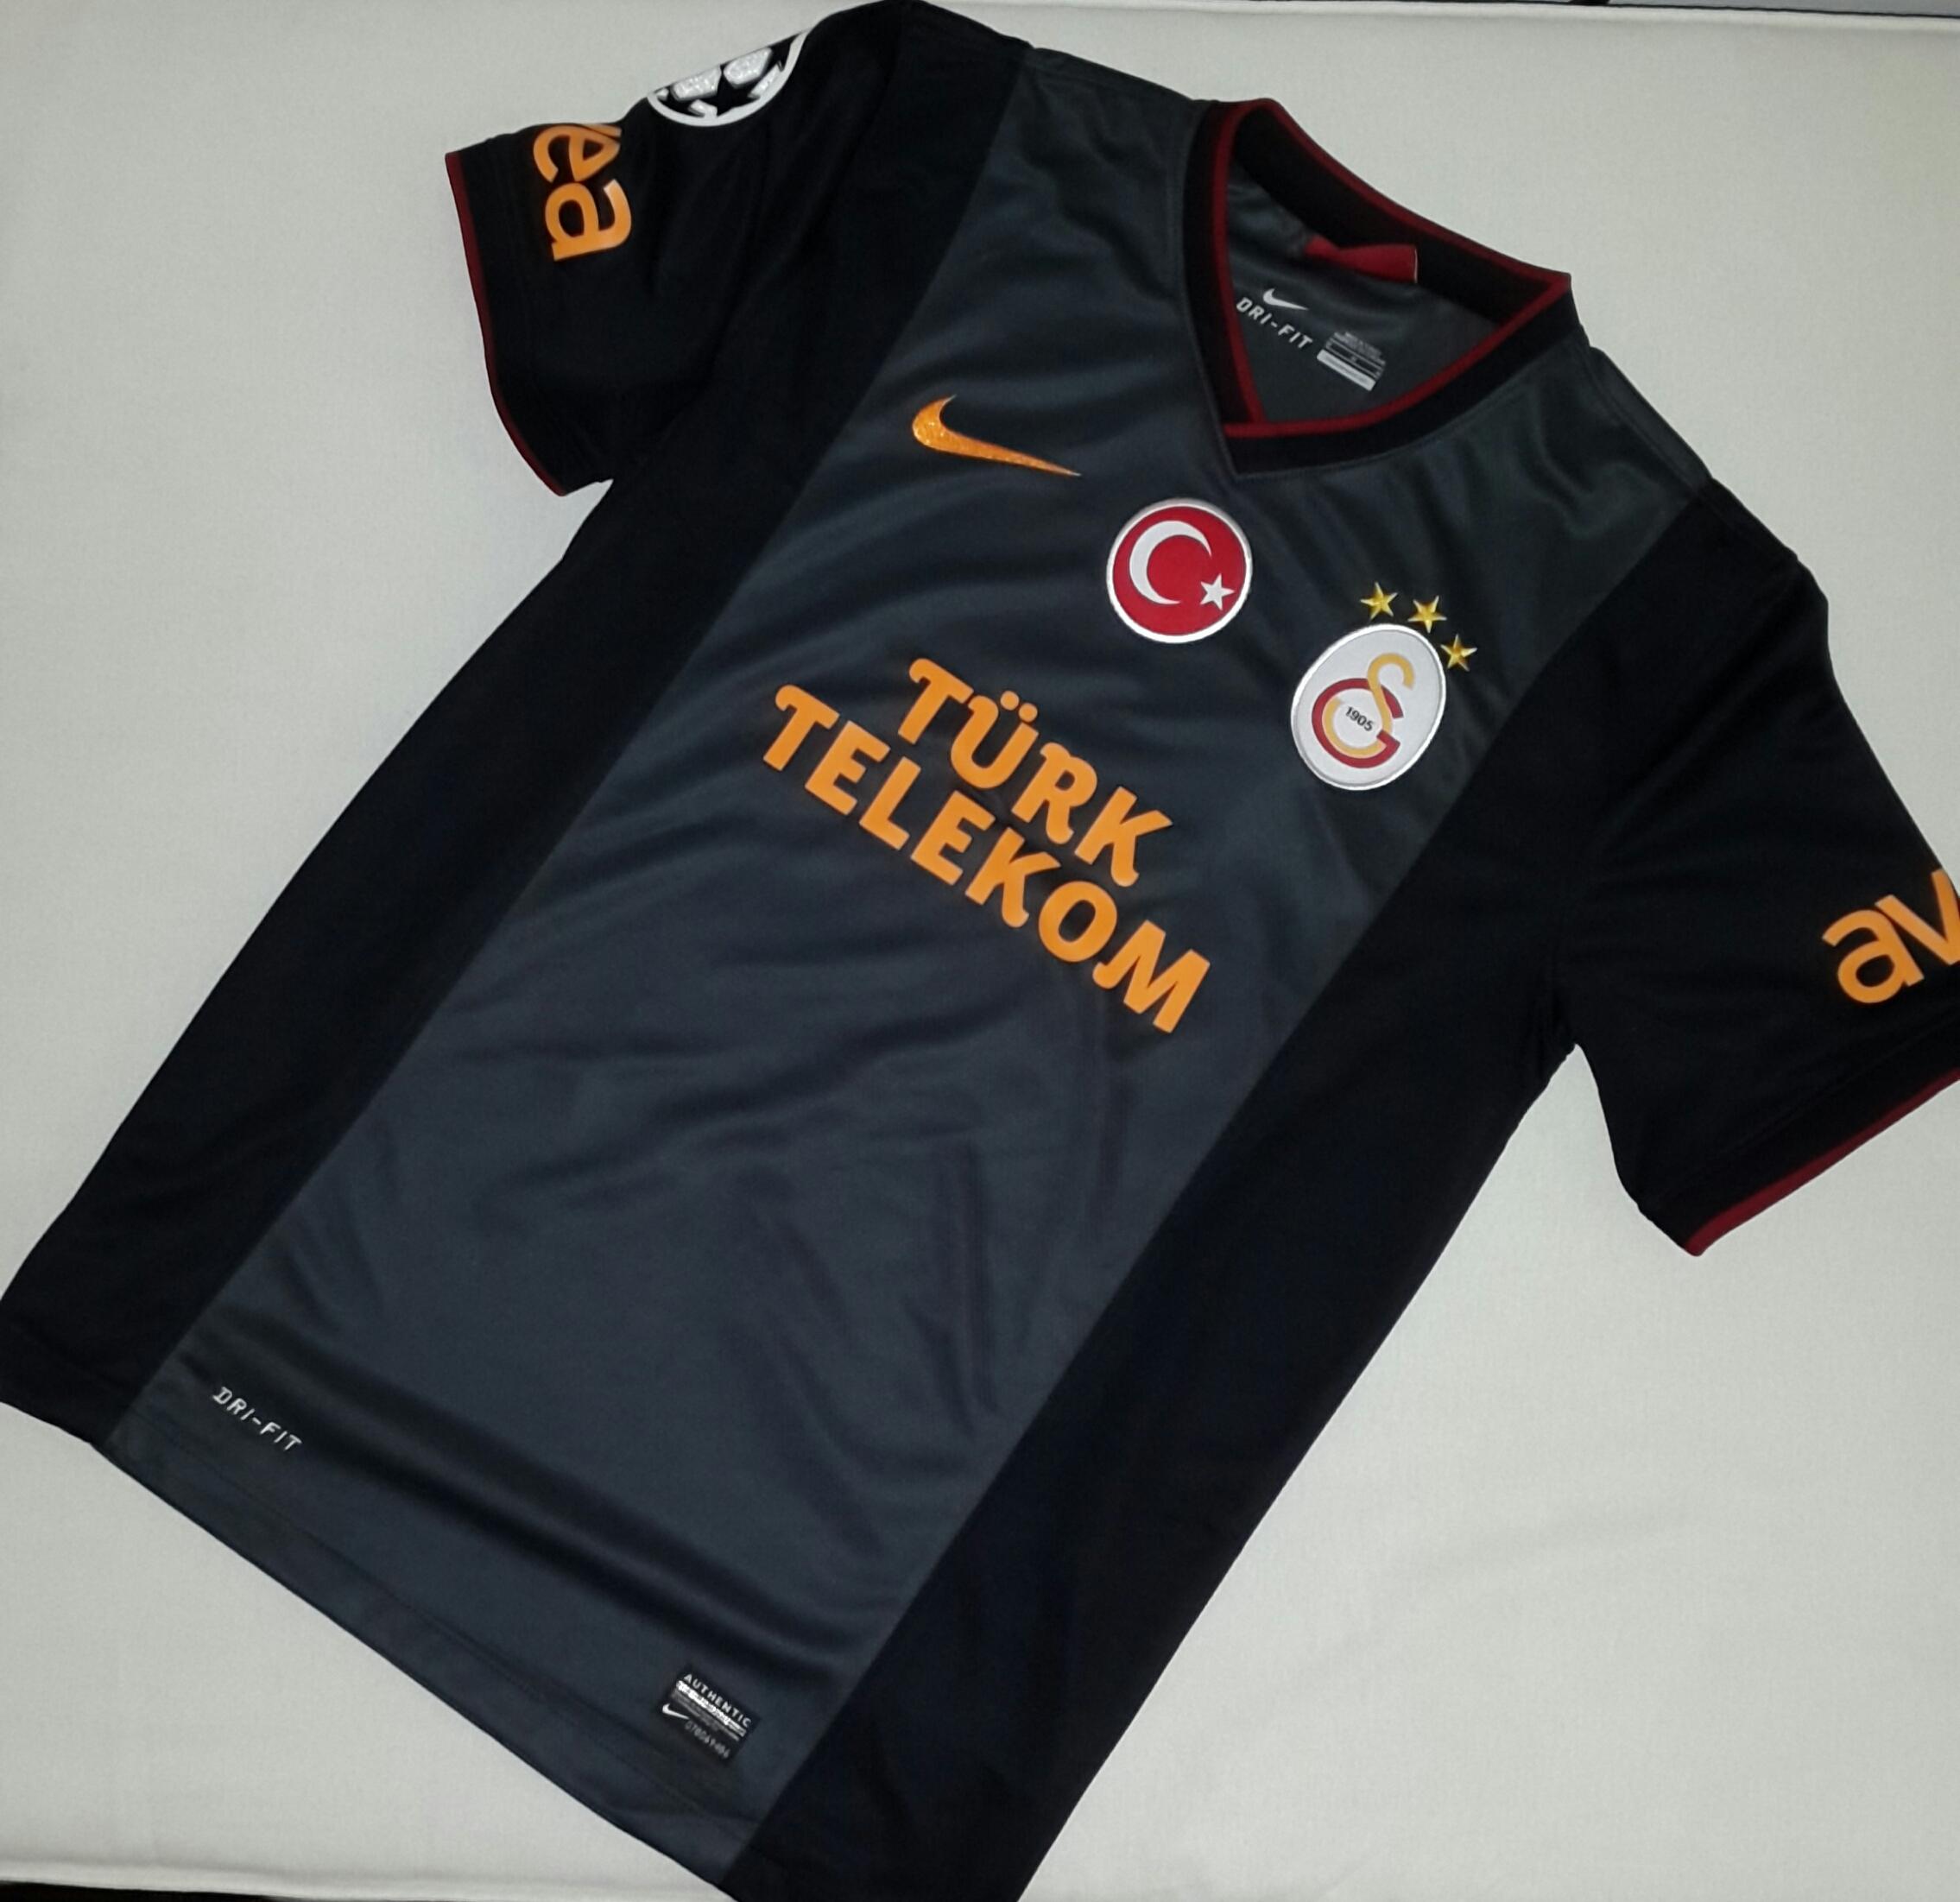 online store f0824 7f911 File:Galatasaray Away Kit 2013-14.jpg - Wikimedia Commons